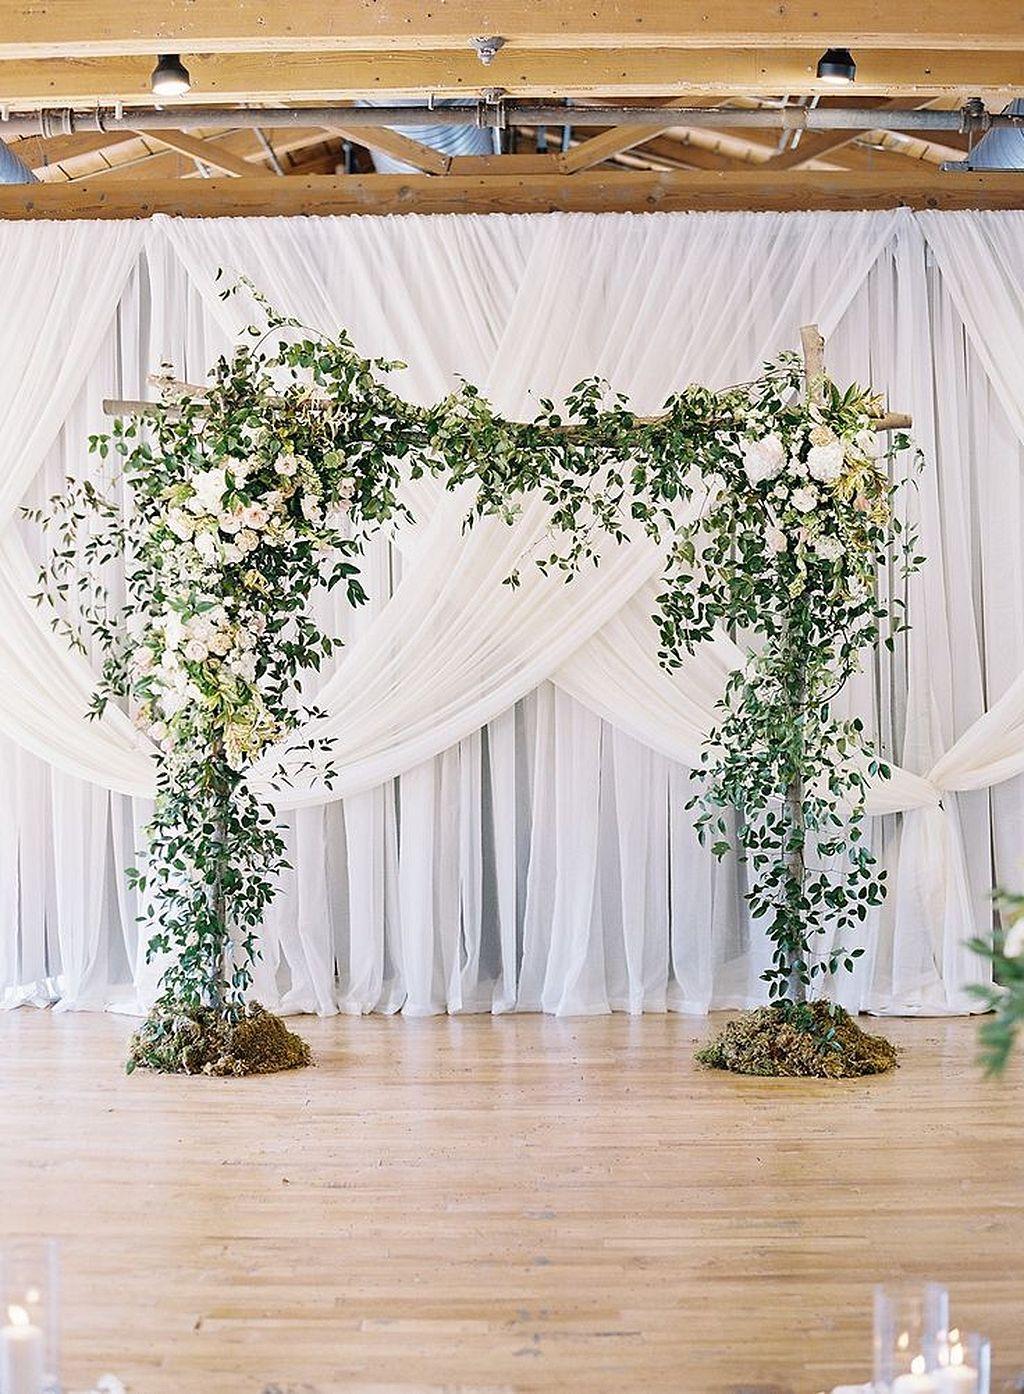 97 floral wedding arch decoration ideas pinterest floral wedding stunning 97 floral wedding arch decoration ideas httpsweddmagz97 floral wedding arch decoration ideas junglespirit Choice Image